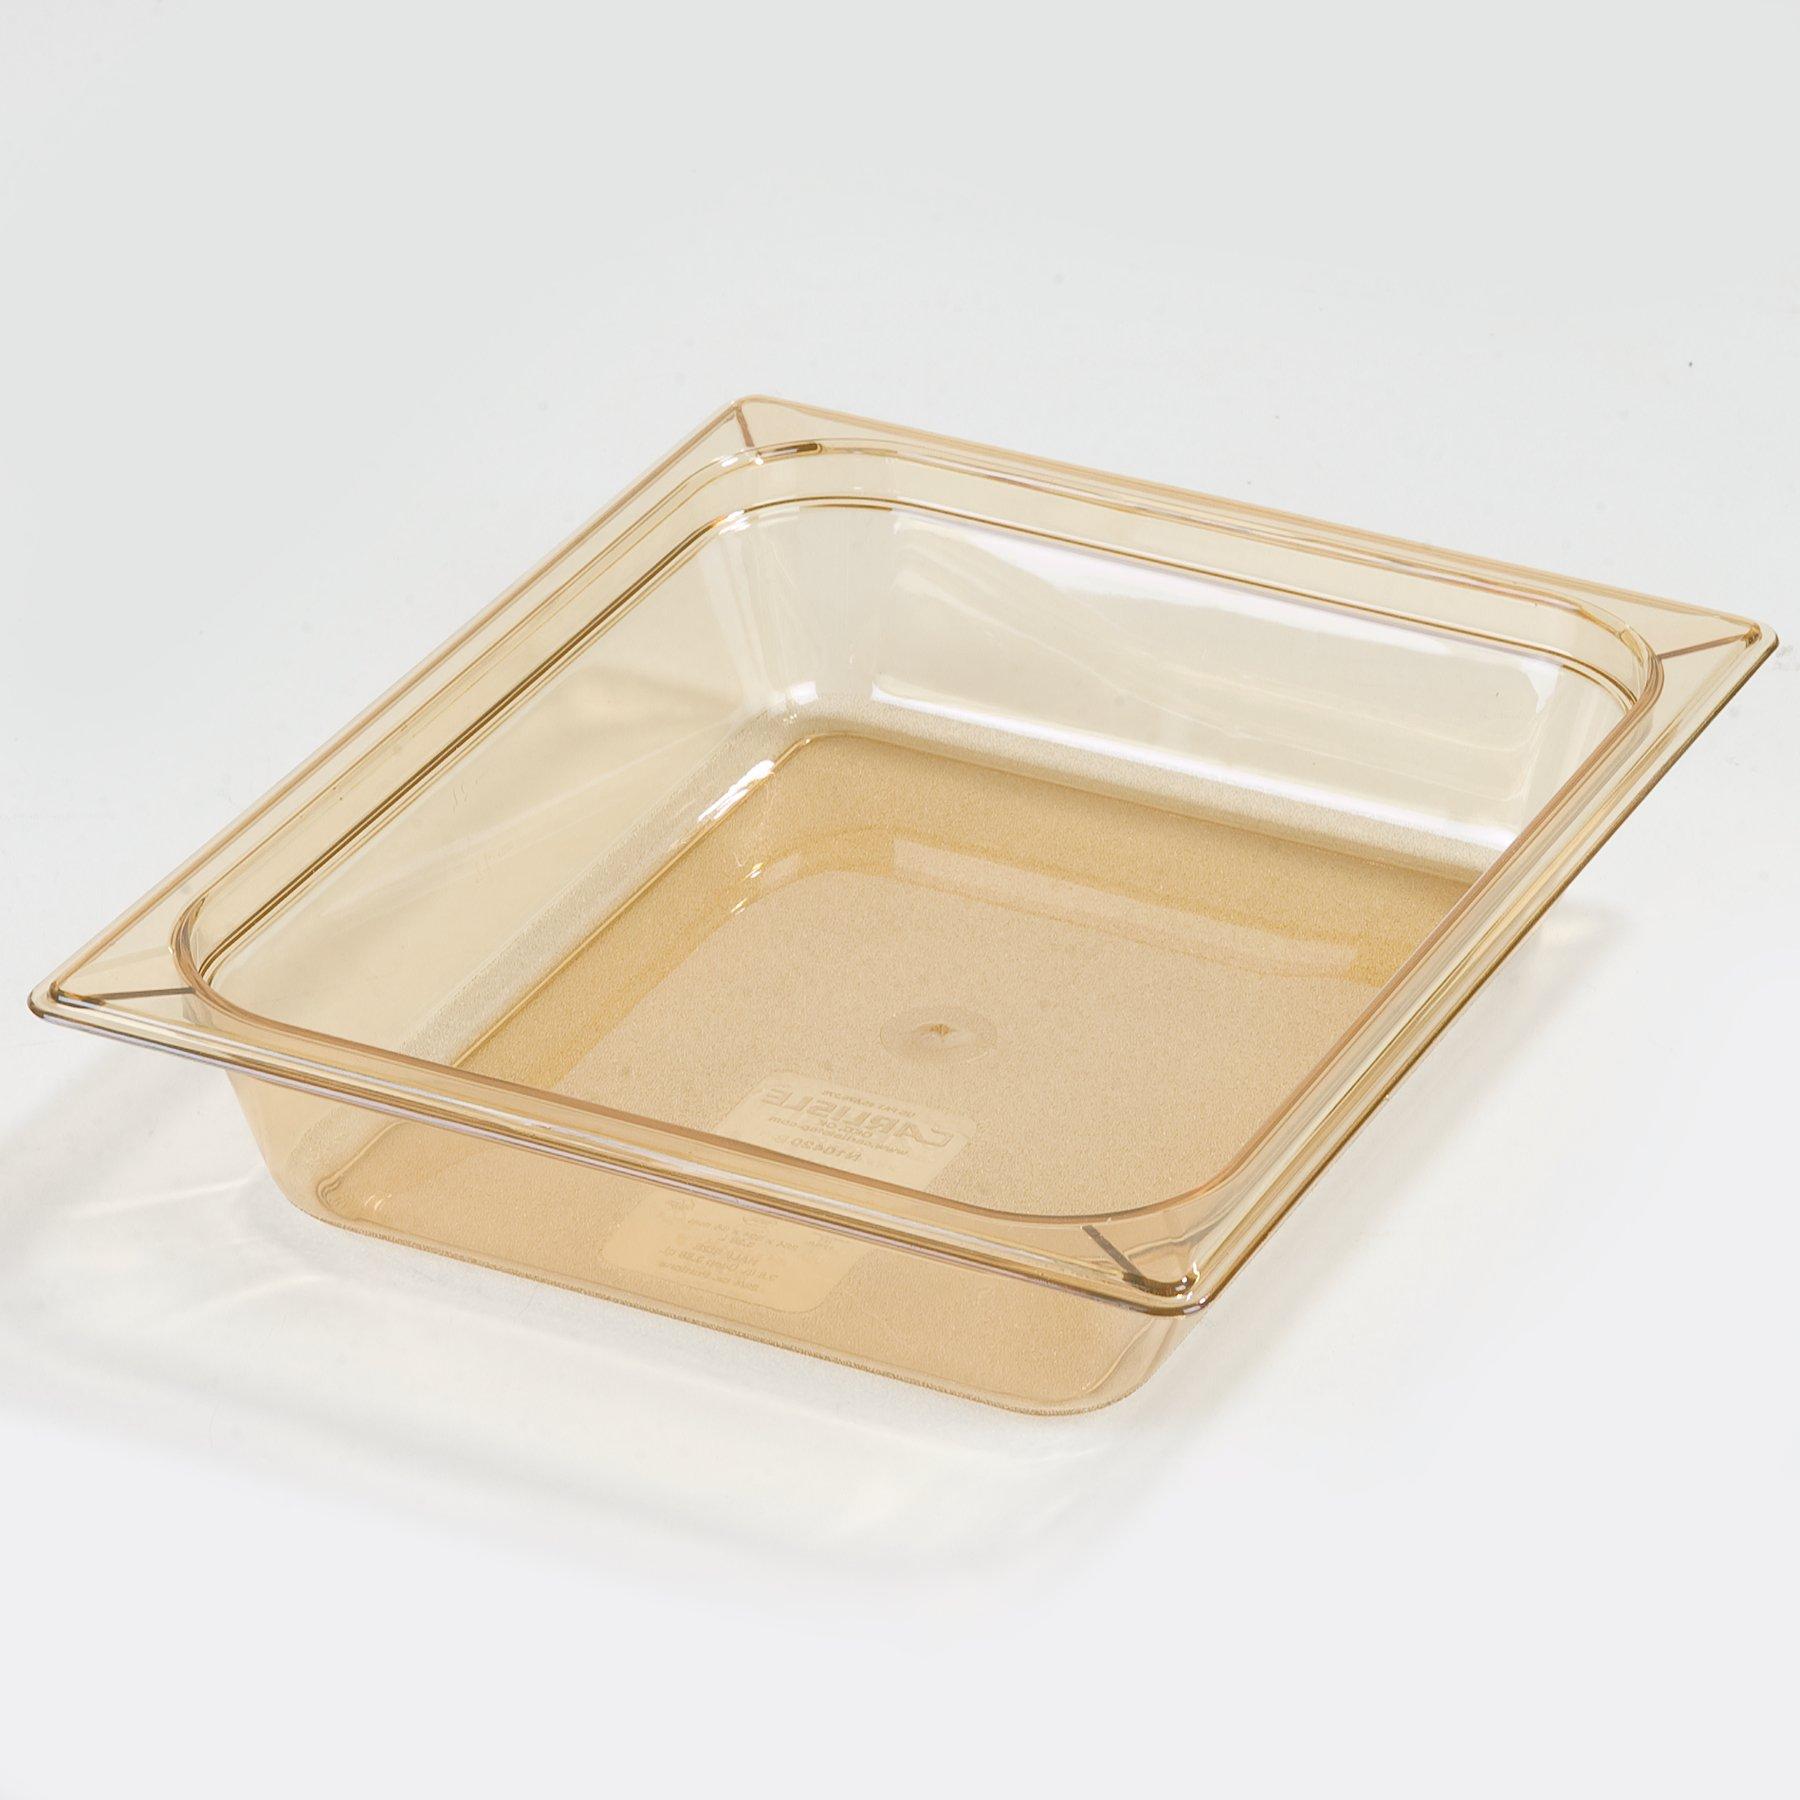 Carlisle 10420B13 StorPlus Gastronorm High-Heat Half-Size Food Pan, 2.5 qt. Capacity, 12-3/4 x 10-3/8 x 2-1/2'', Amber (Case of 6)